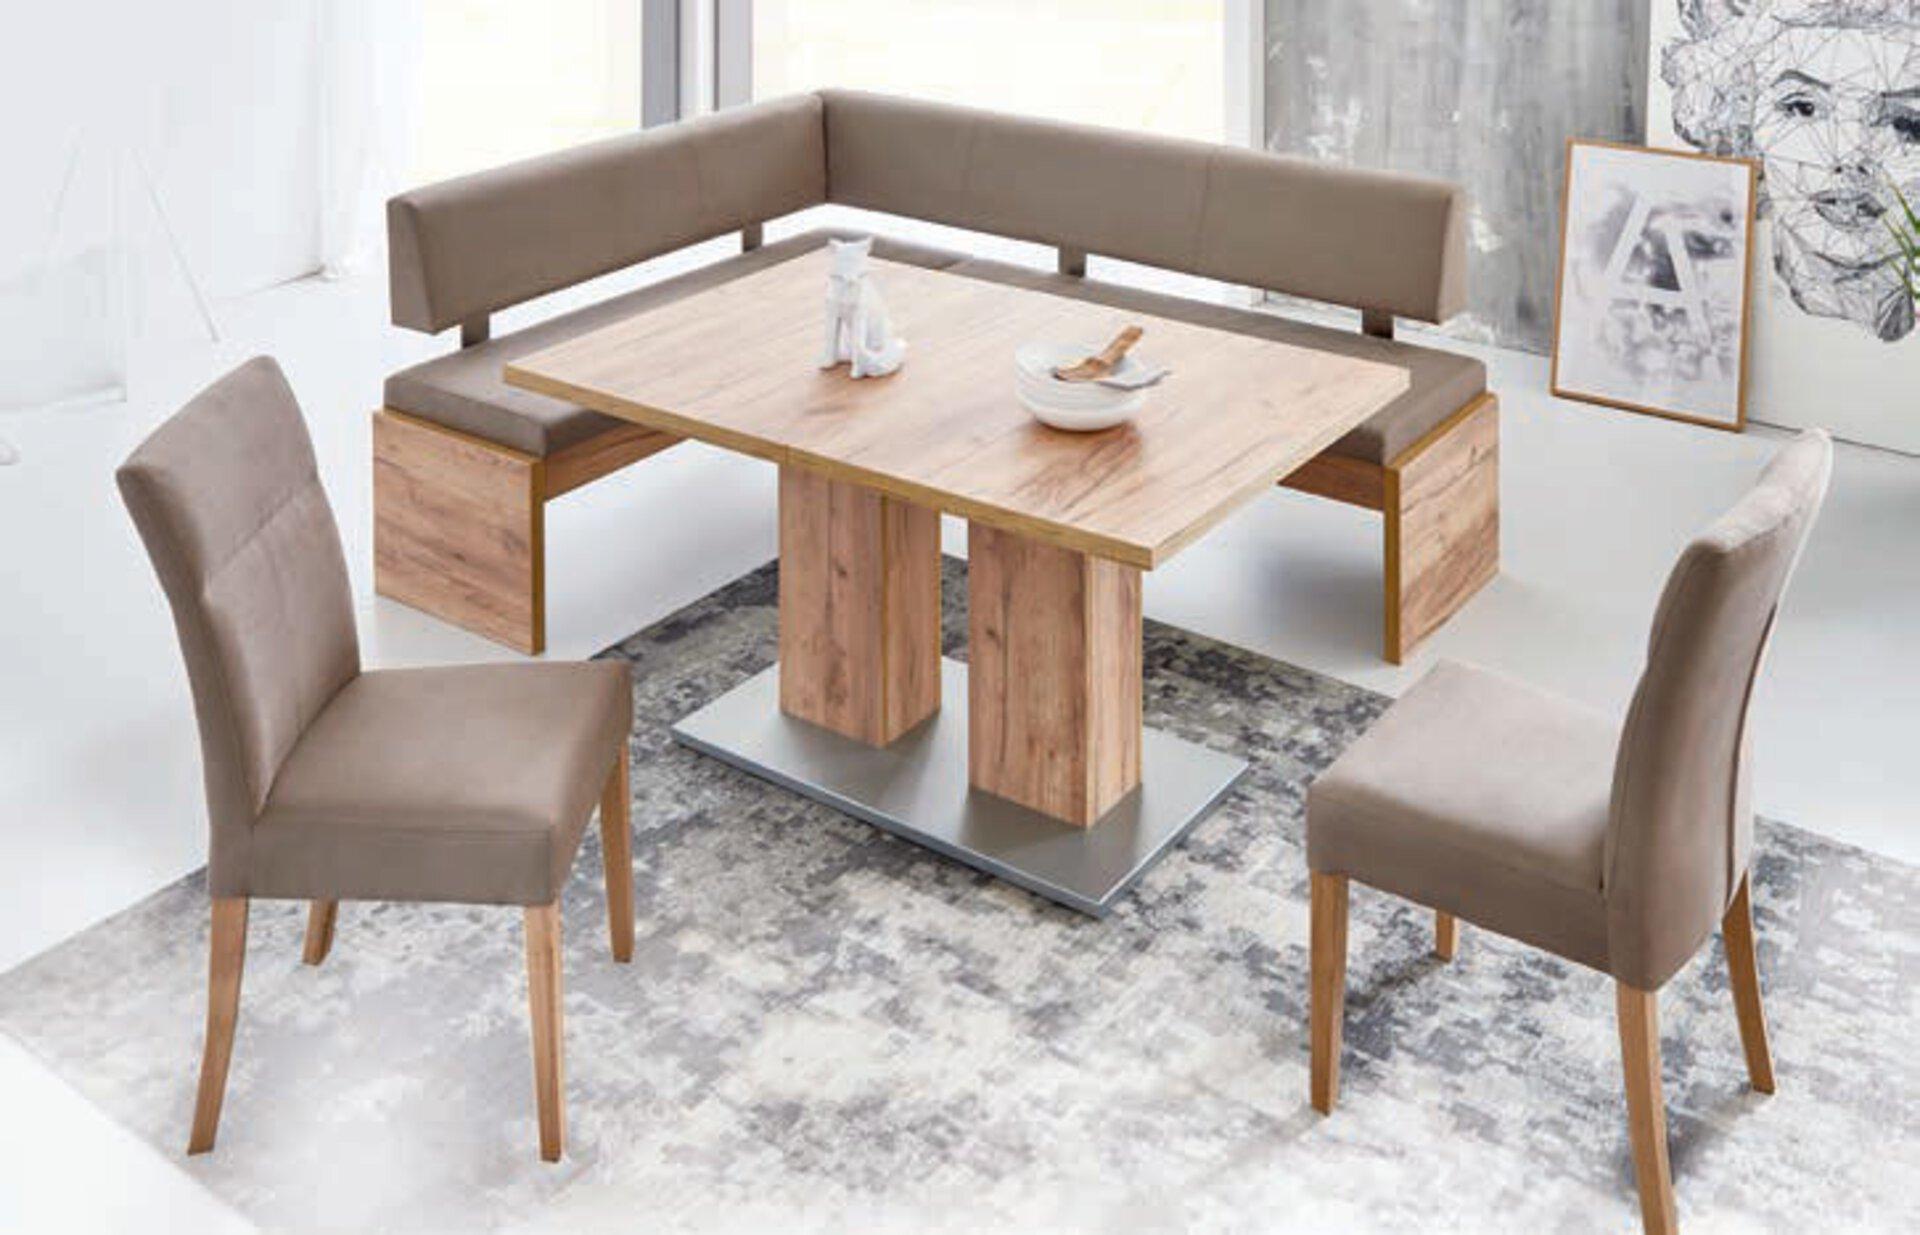 4-Fuß-Stuhl 1031-78-187 Niehoff Sitzmöbel Holz